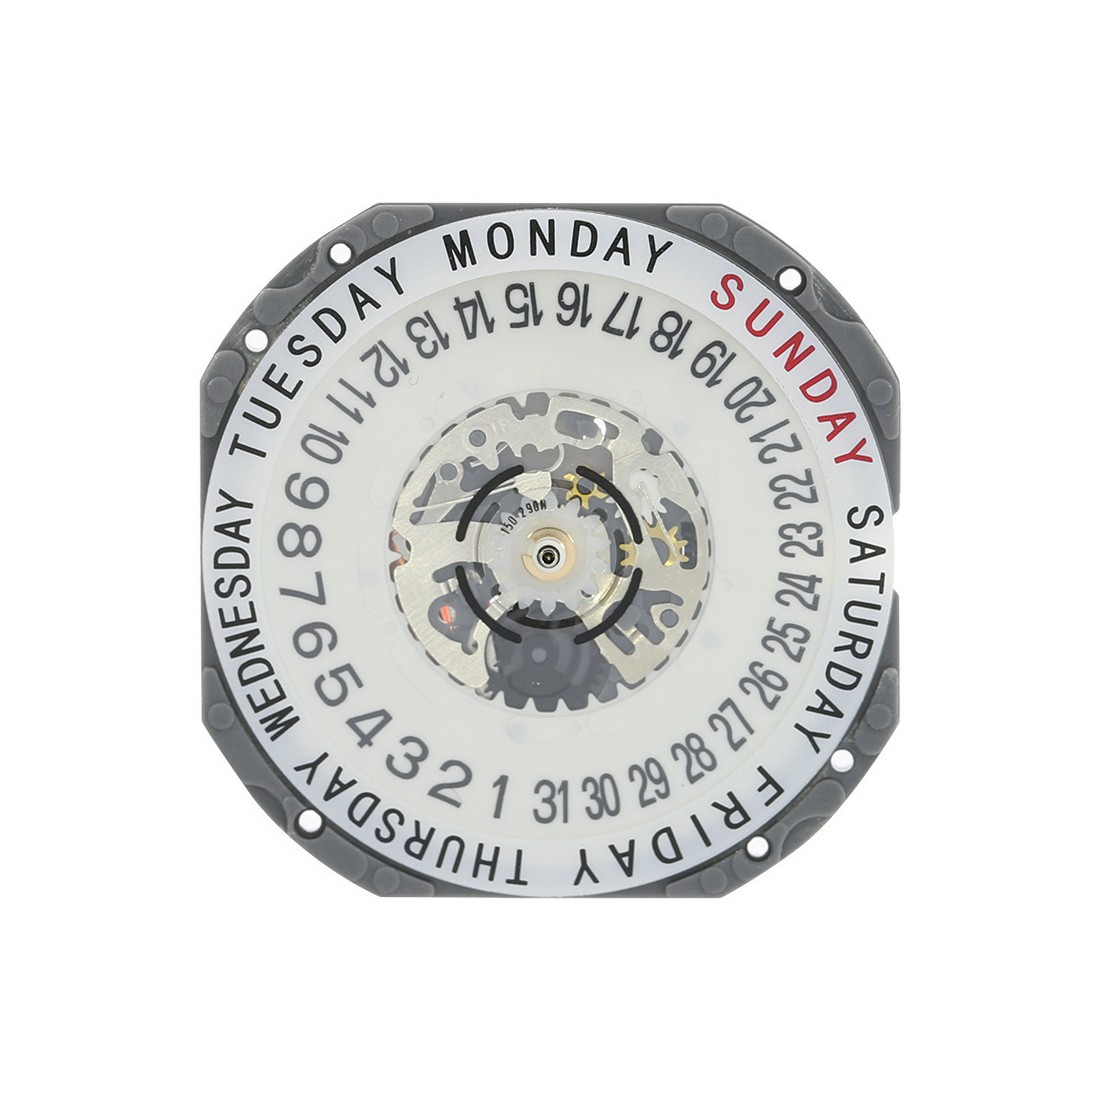 Hattori VJ55 Quartz Watch Movement-3888